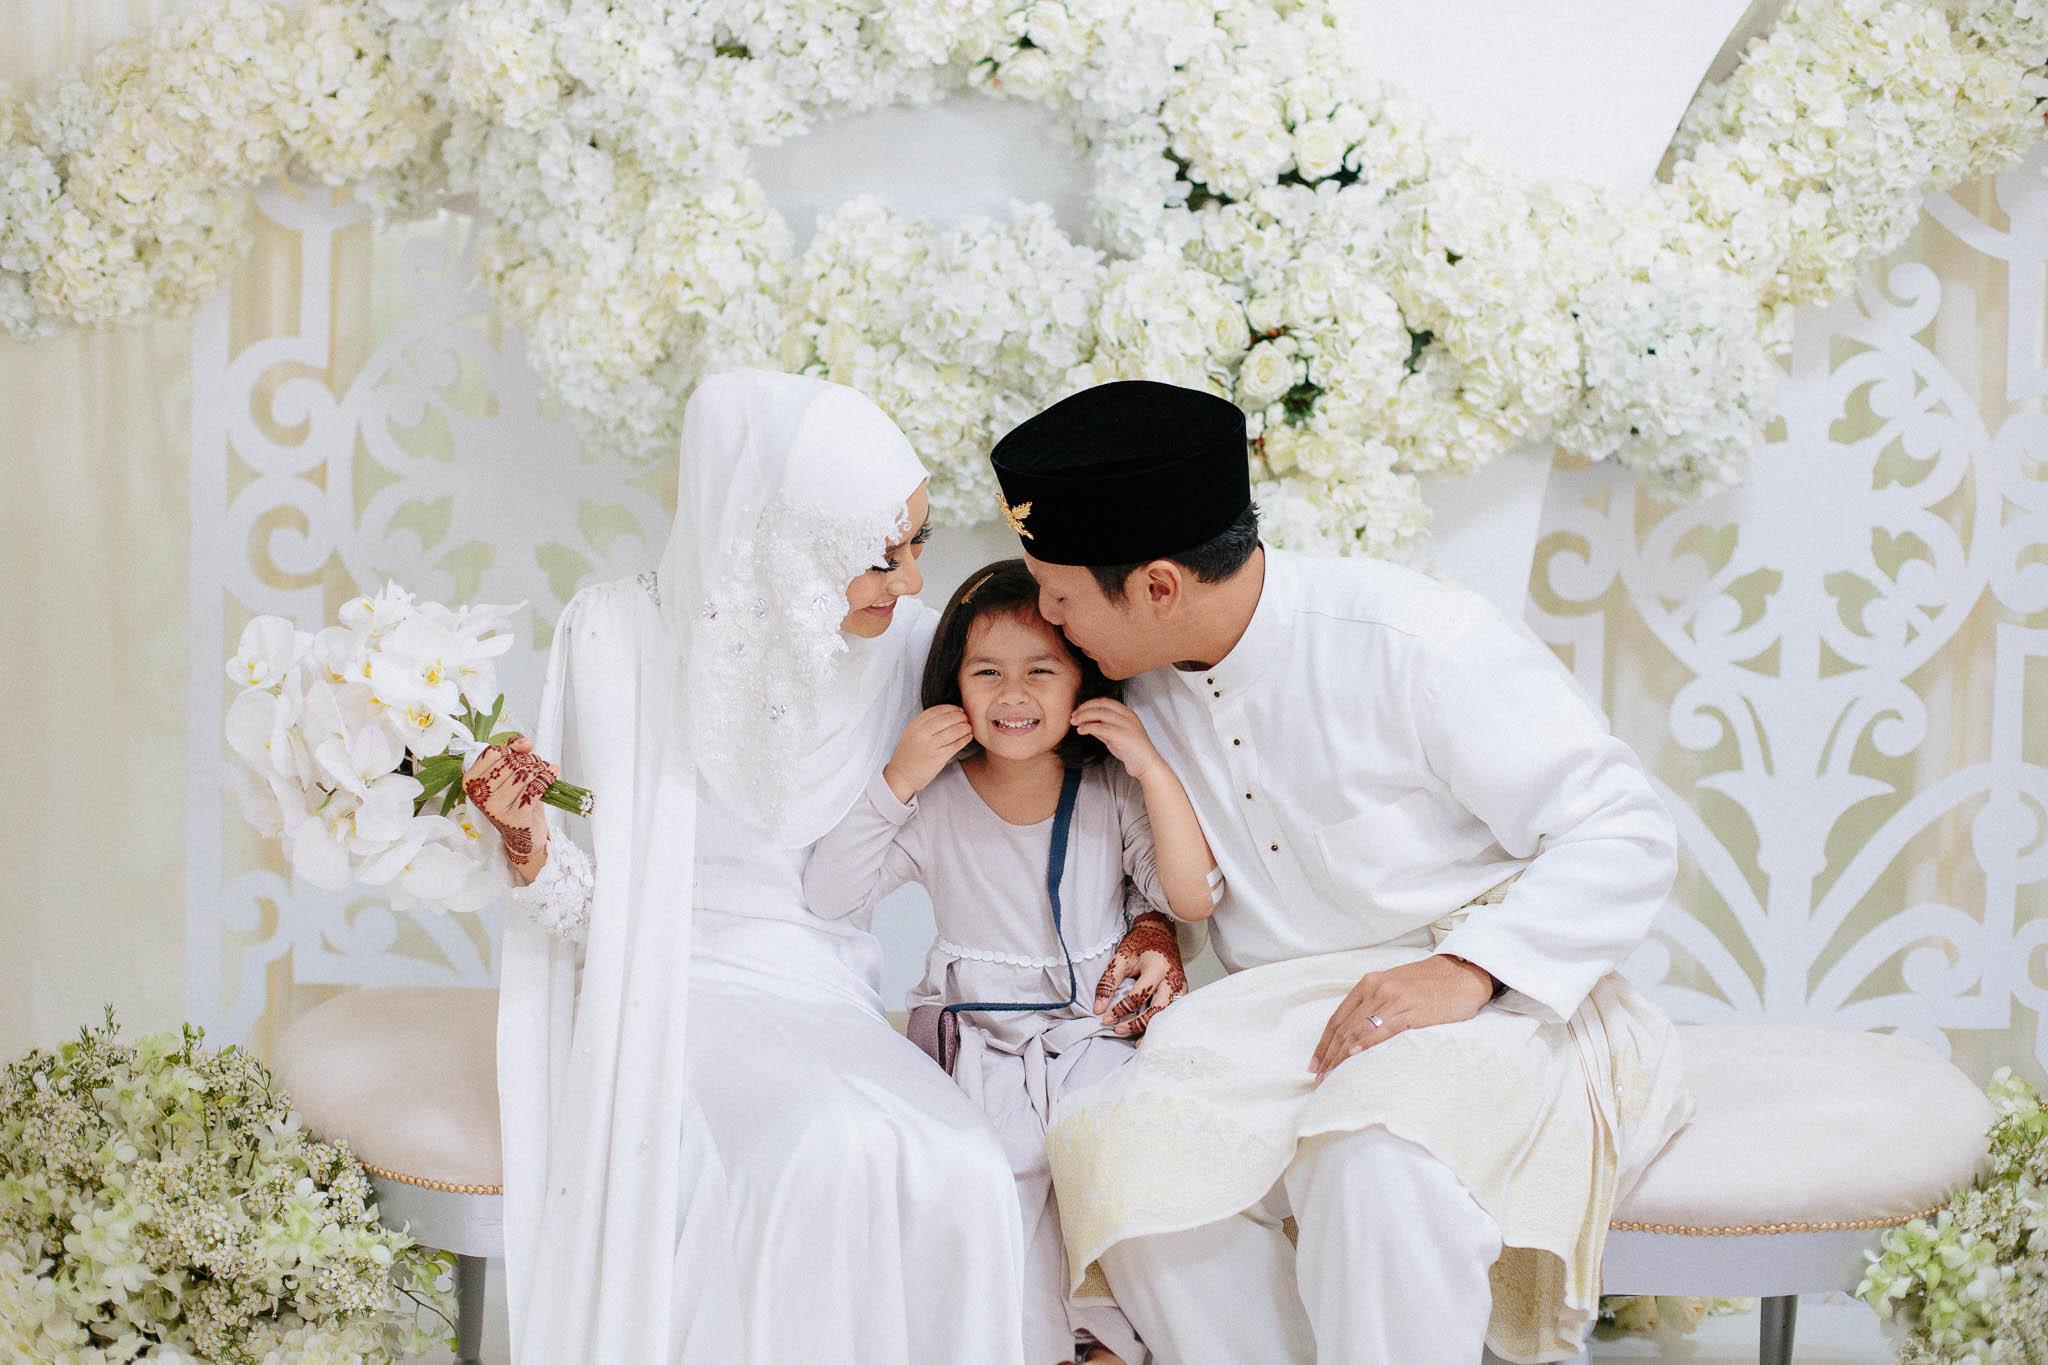 singapore-wedding-photographer-sarah-razif-58.jpg